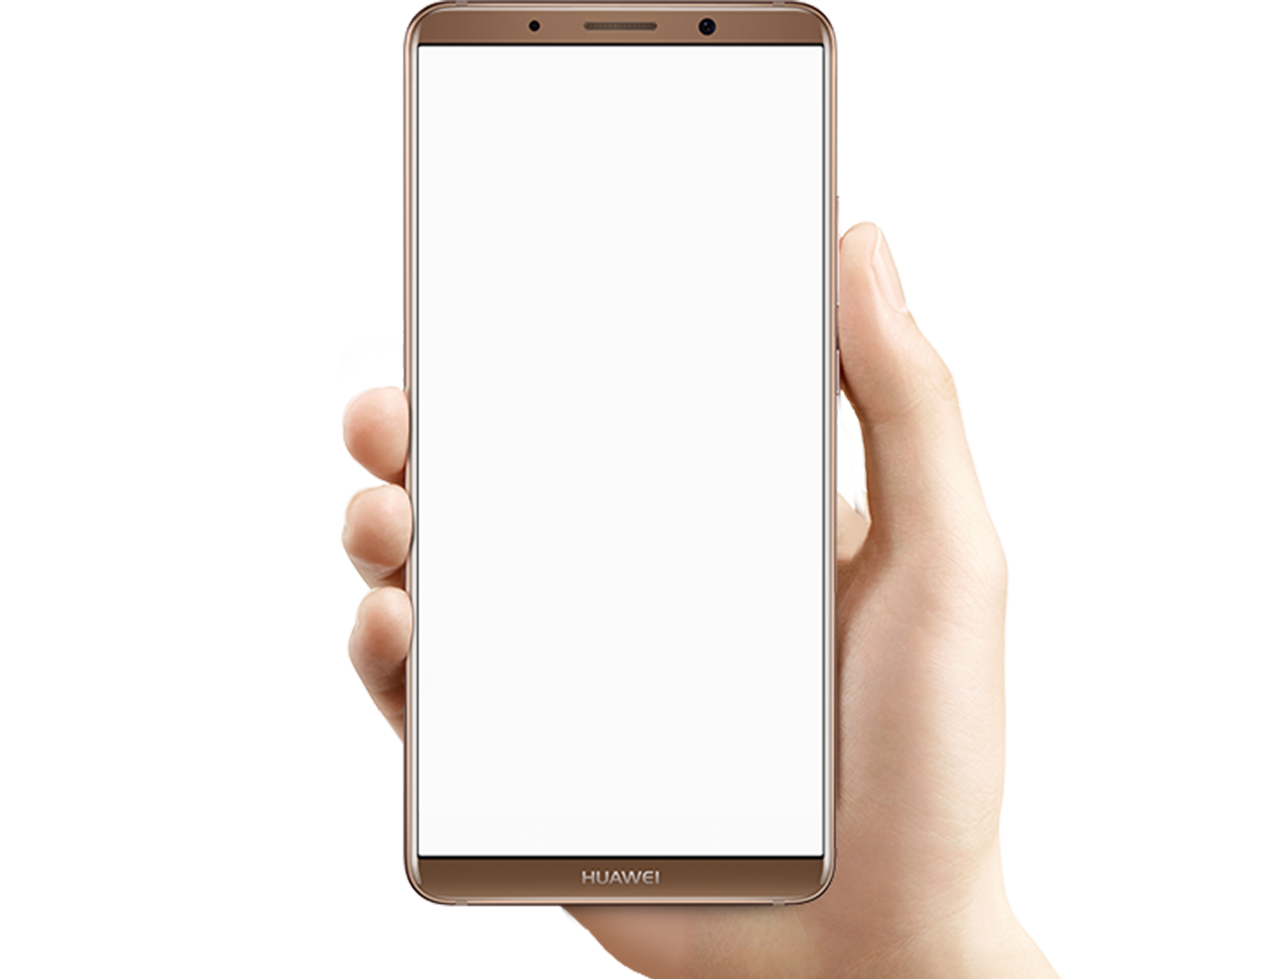 Huawei Mate 10 Pro App Phone Template Smartphone Hacks Hand Phone